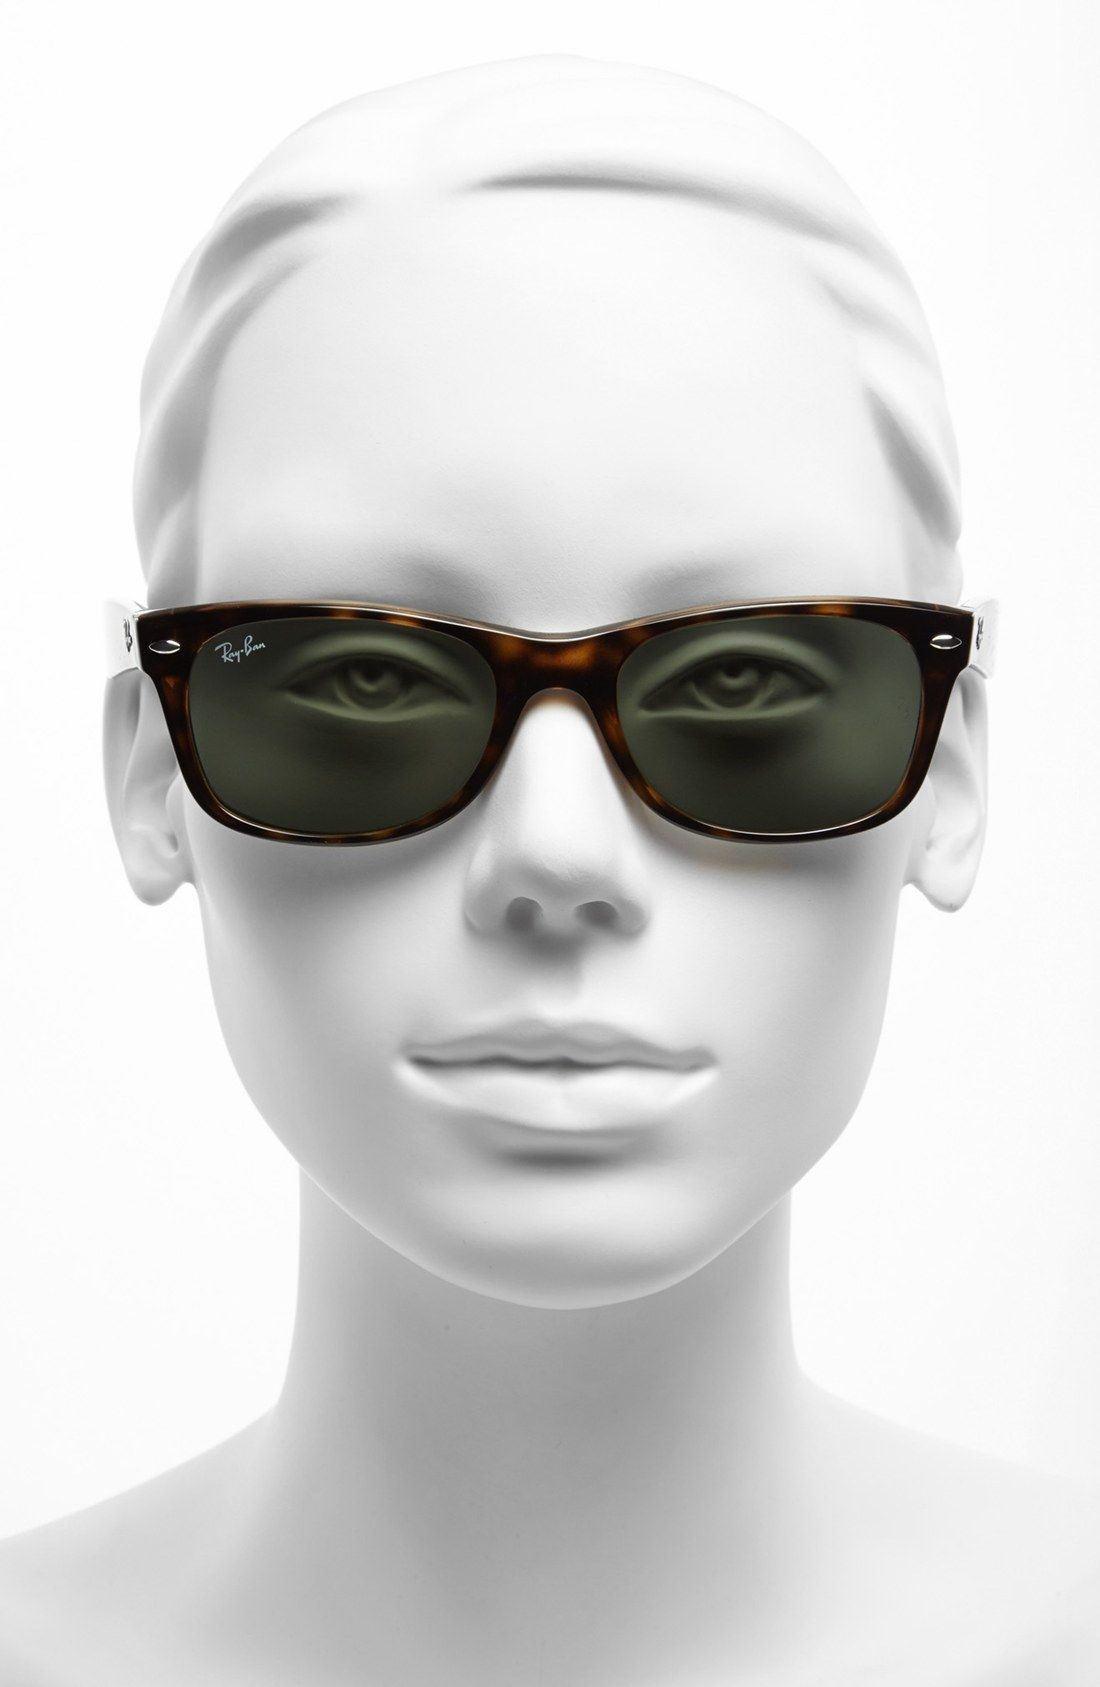 2c69288b61 ... ireland ray ban new small wayfarer 52mm sunglasses 8a264 beb43